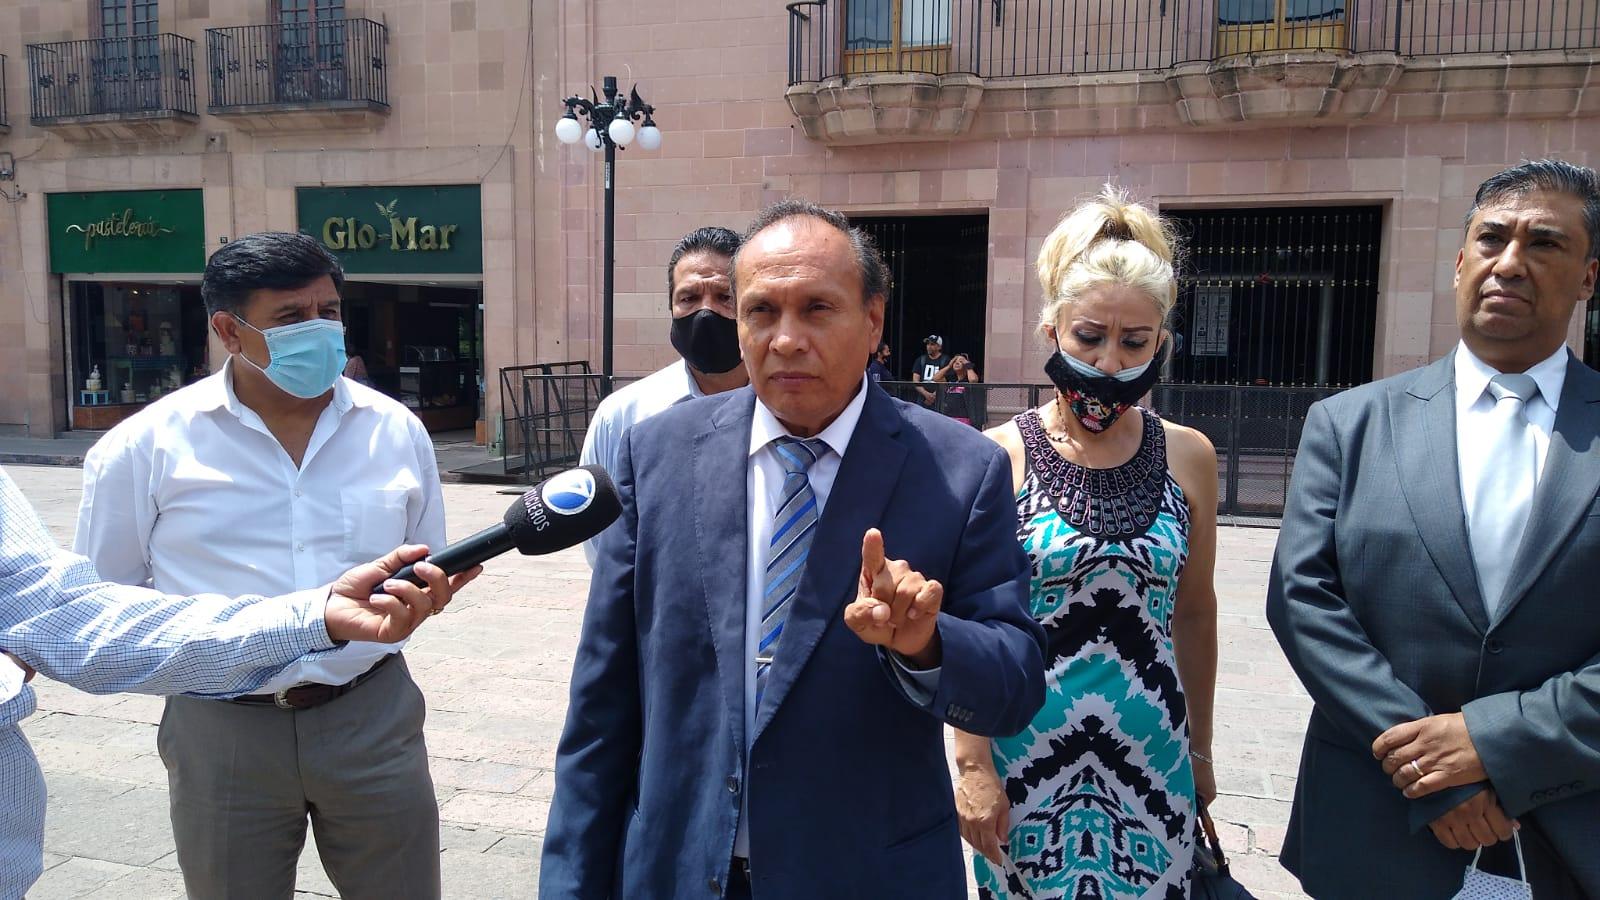 El Poder Judicial está colapsado en San Luis Potosí: abogados